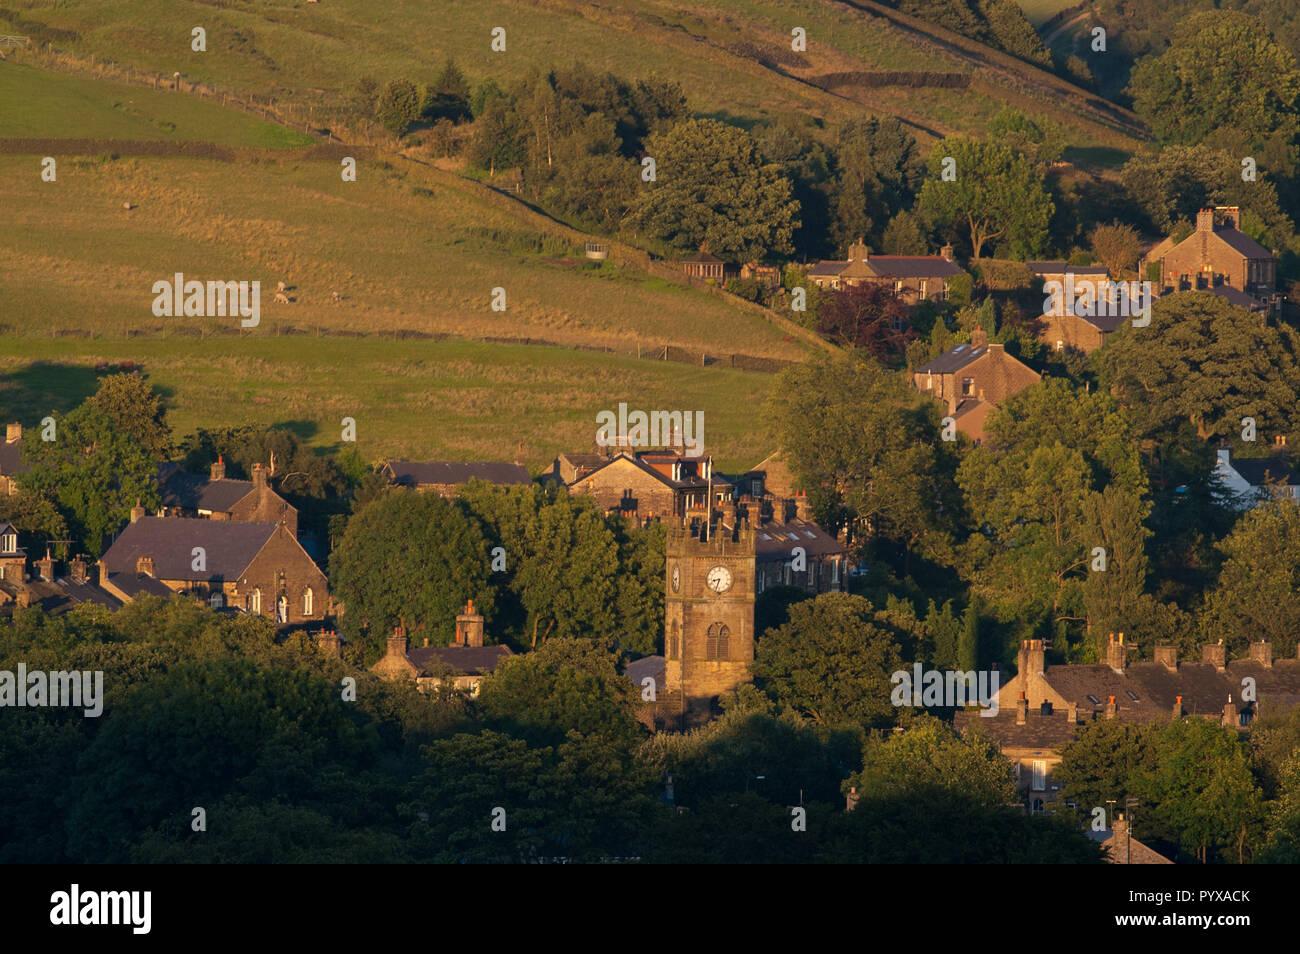 Hayfield village - Stock Image